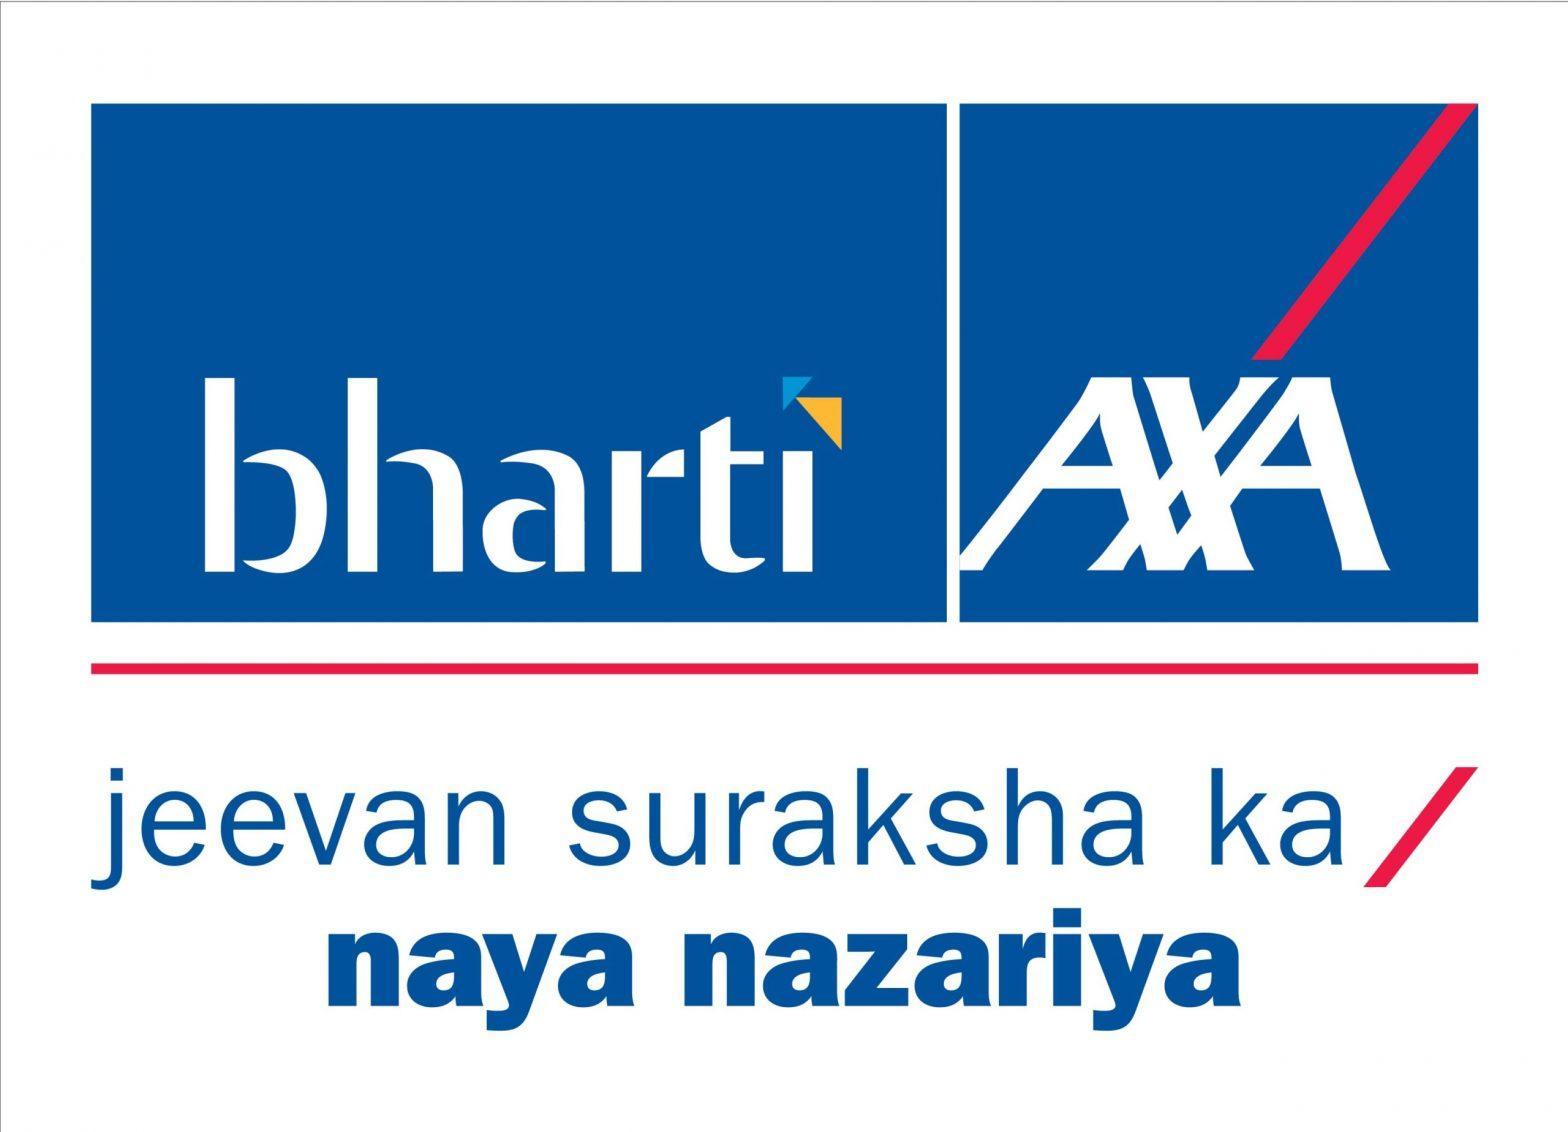 Bharti AXA Life in bancassurance pact with Shivalik Small Finance Bank | சிவாலிக் சிறு நிதி நிறுவன வங்கியுடன் பாரதி ஆக்ஸா லைஃப் வங்கி ஆயுள் காப்பீடு ஒப்பந்தம் செய்துள்ளது. |_40.1